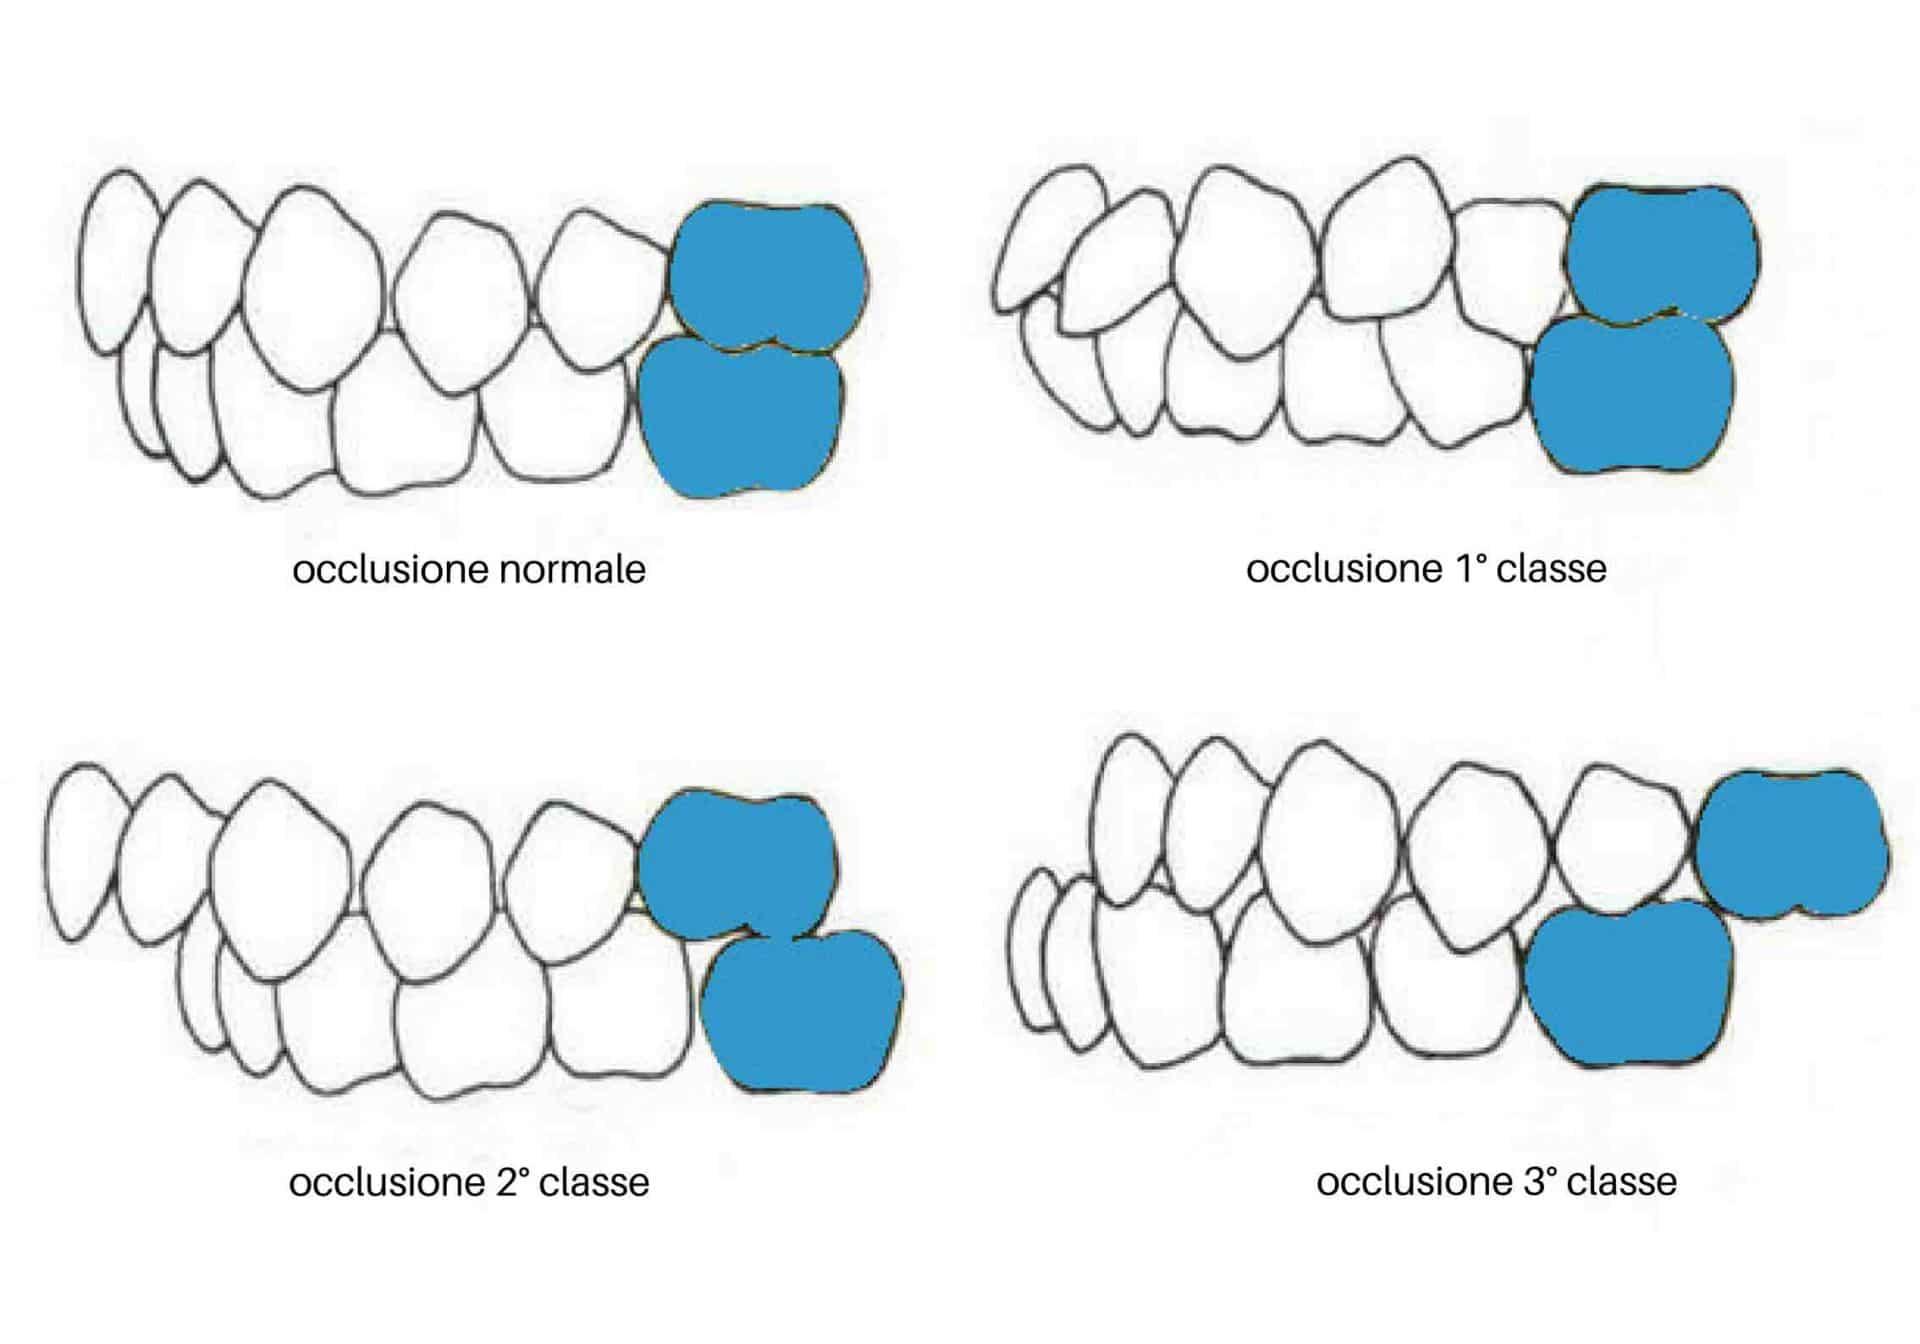 classificazione occlusione denti da latte